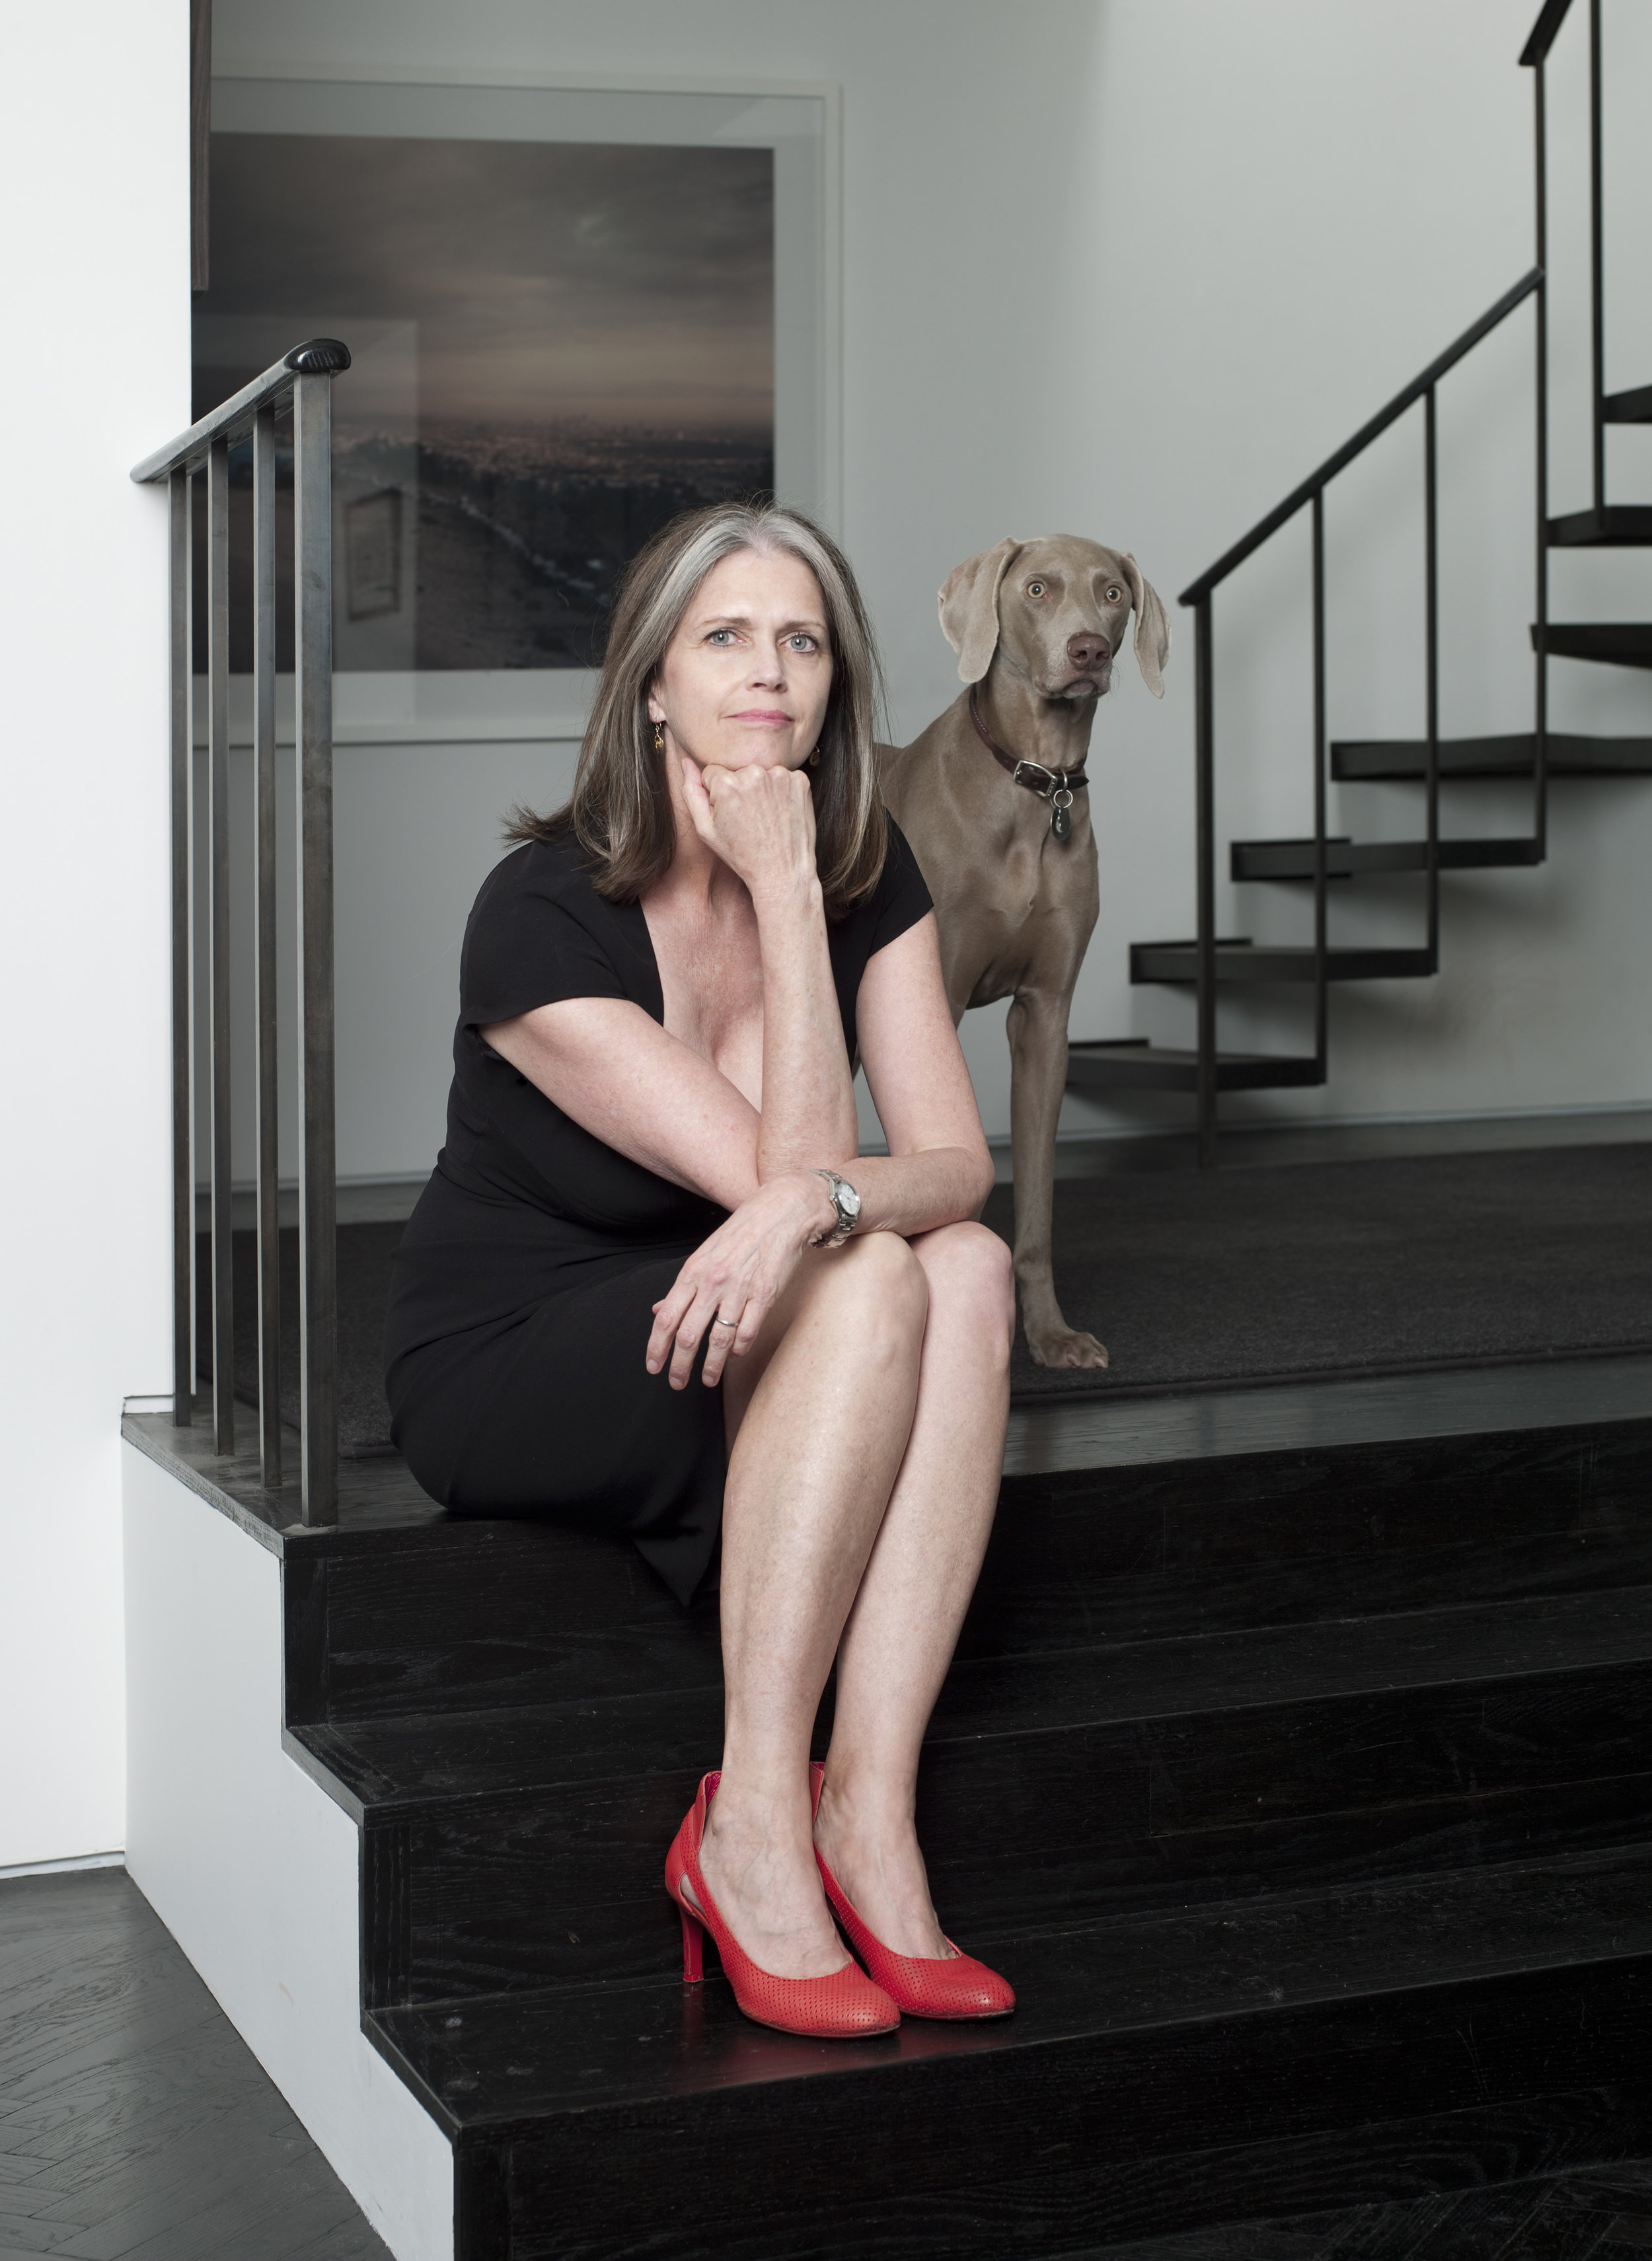 Deborah at home. Photo by Rebecca Greenfield